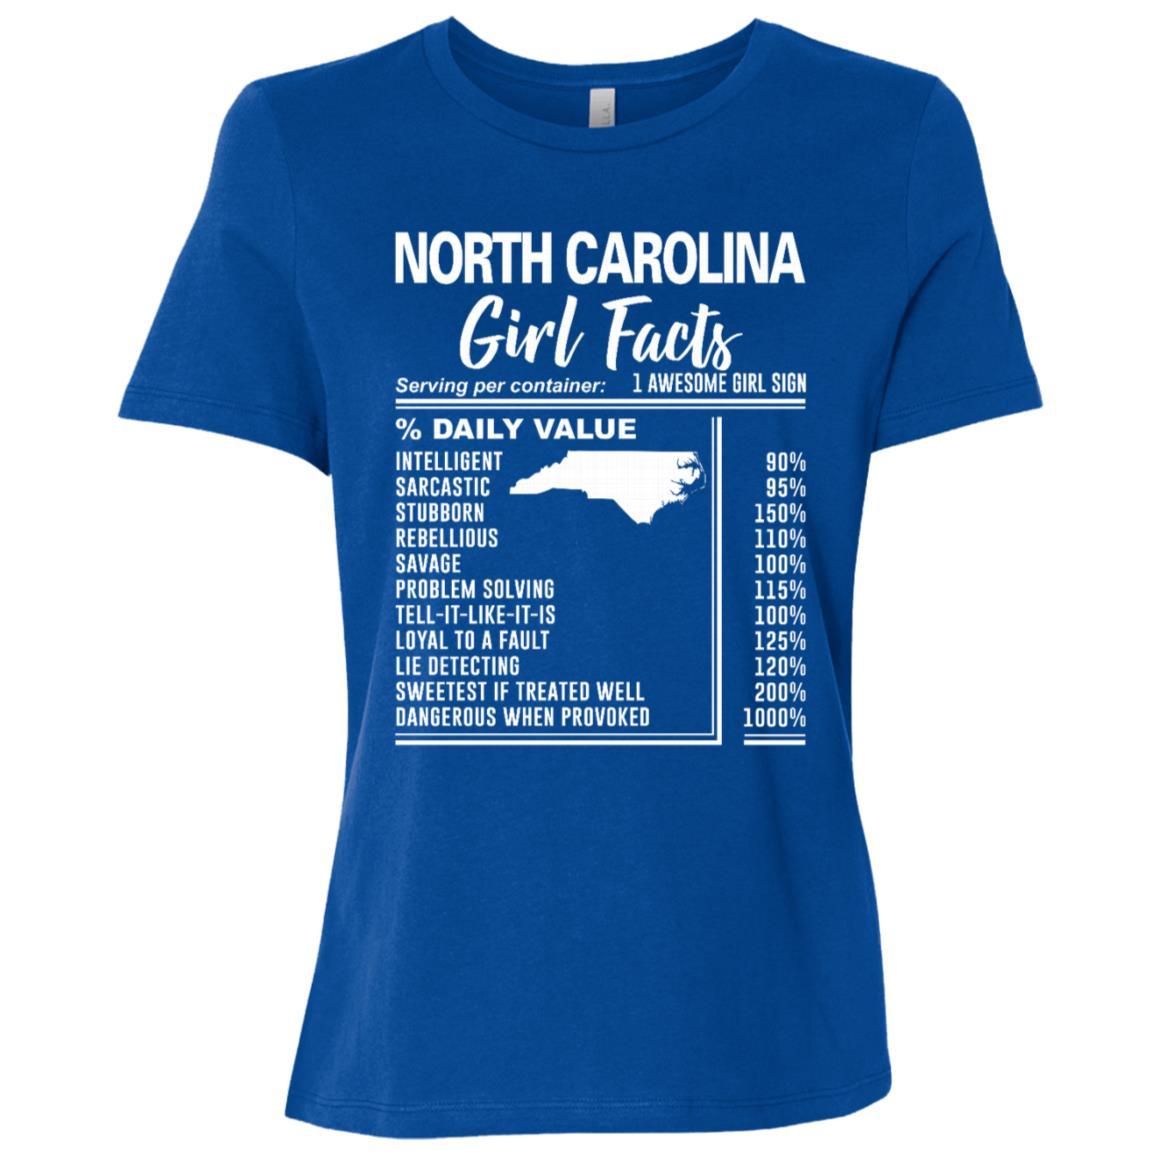 Born in North Carolina Girl Facts Women Short Sleeve T-Shirt